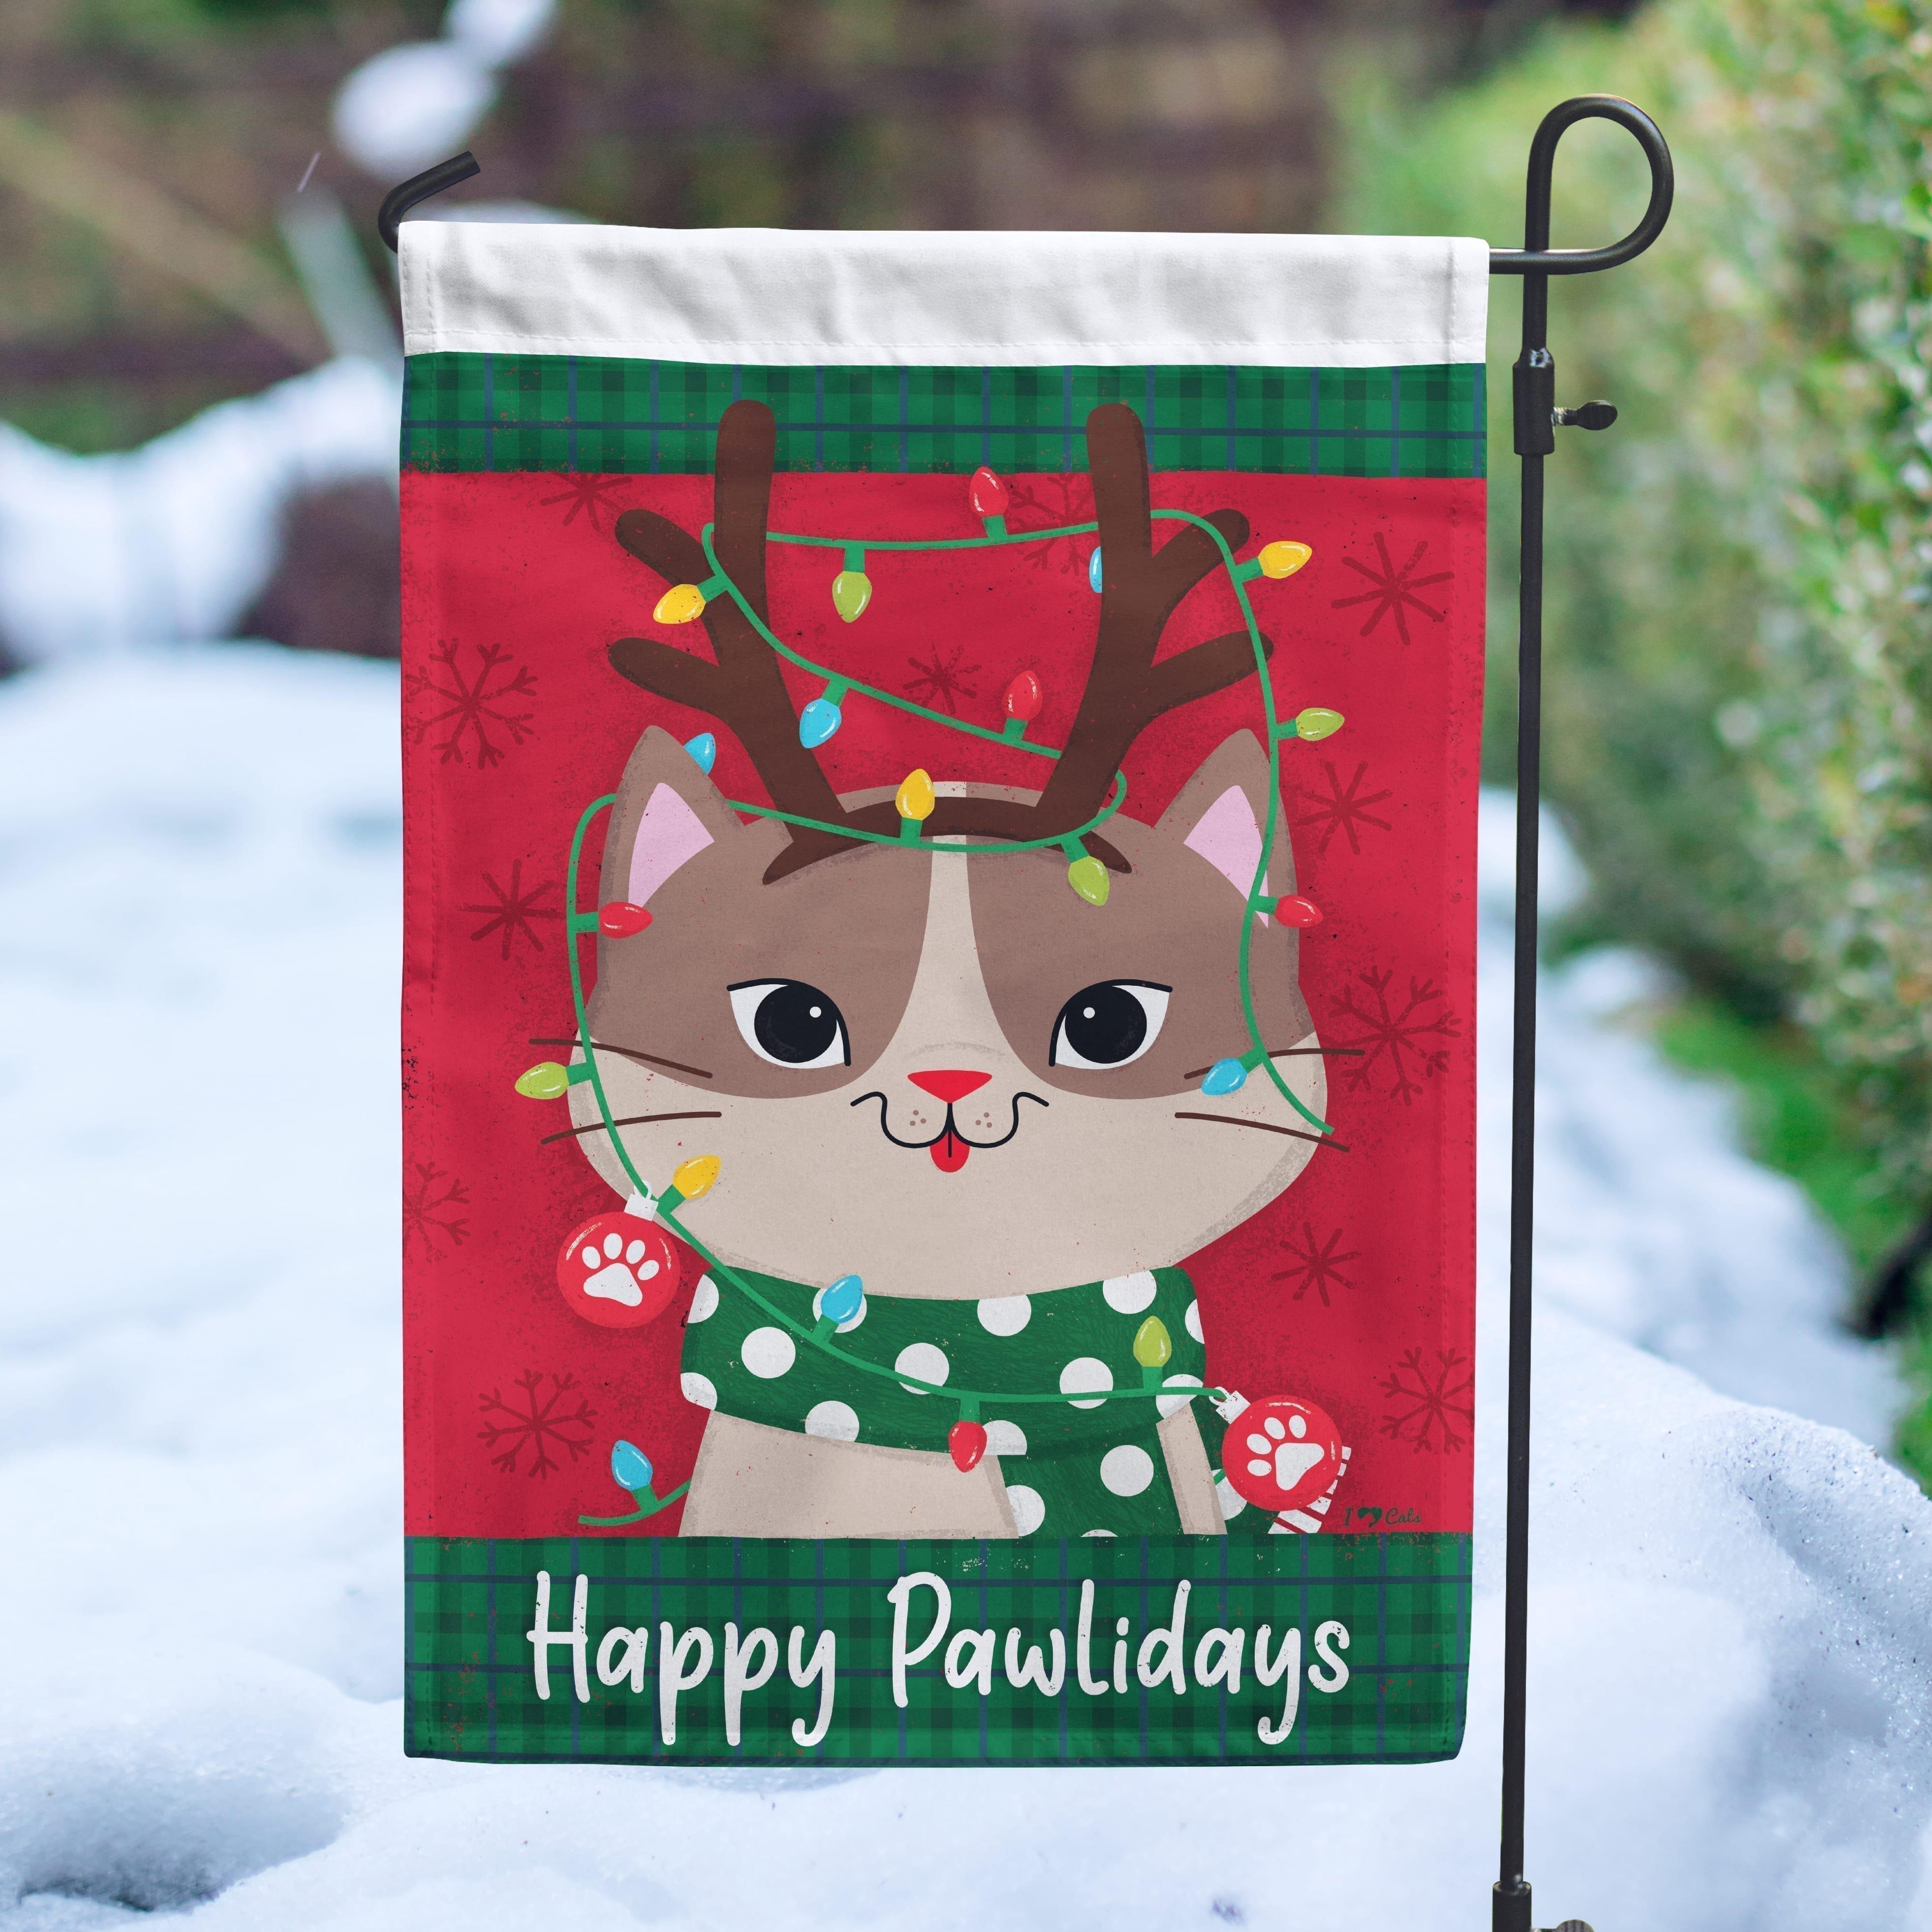 Happy Pawlidays Reindeer Kitty Garden Flag - Get 2 for $14.99!